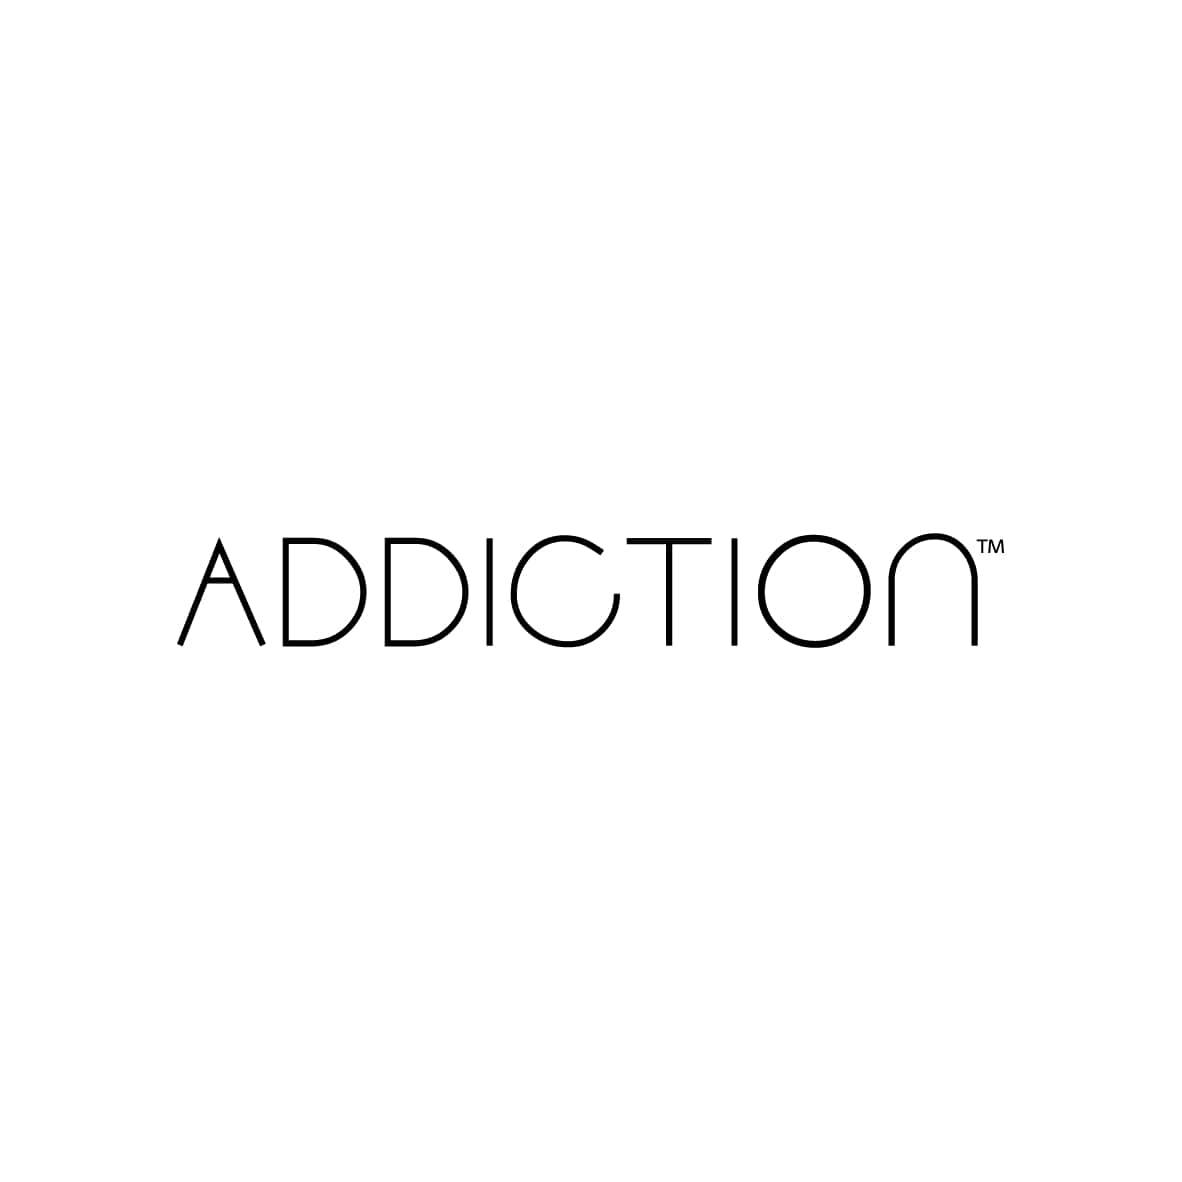 Addiction Logo